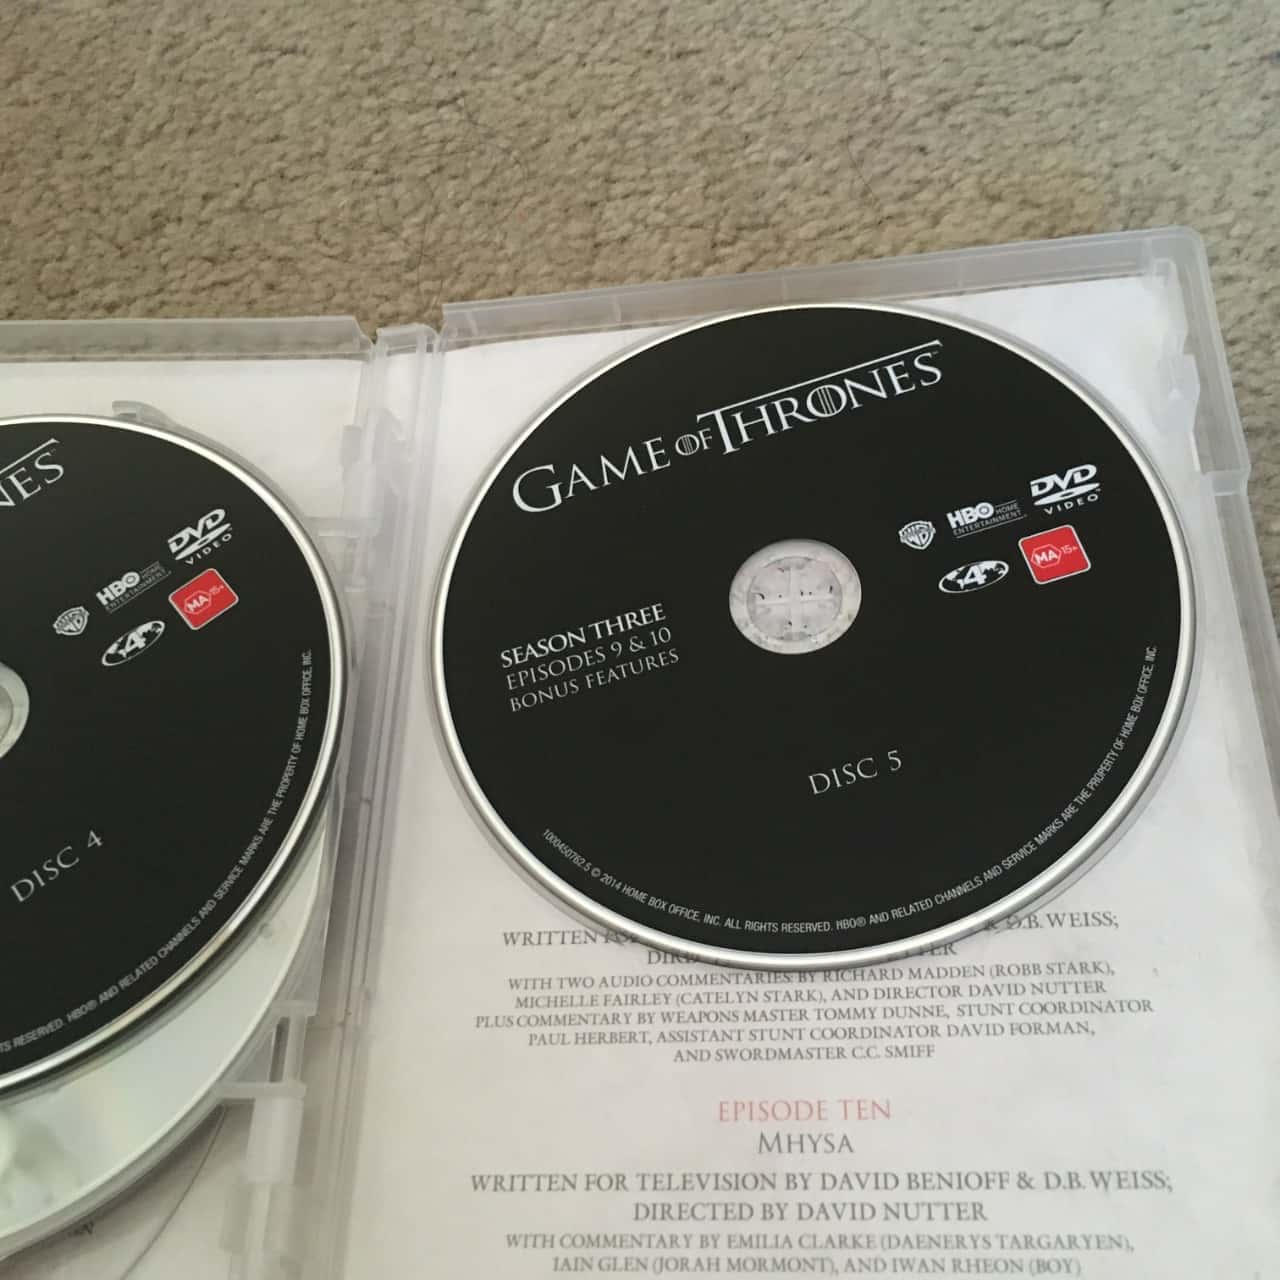 Game of Thrones DVD - The Complete Third Season, Region Code : 4